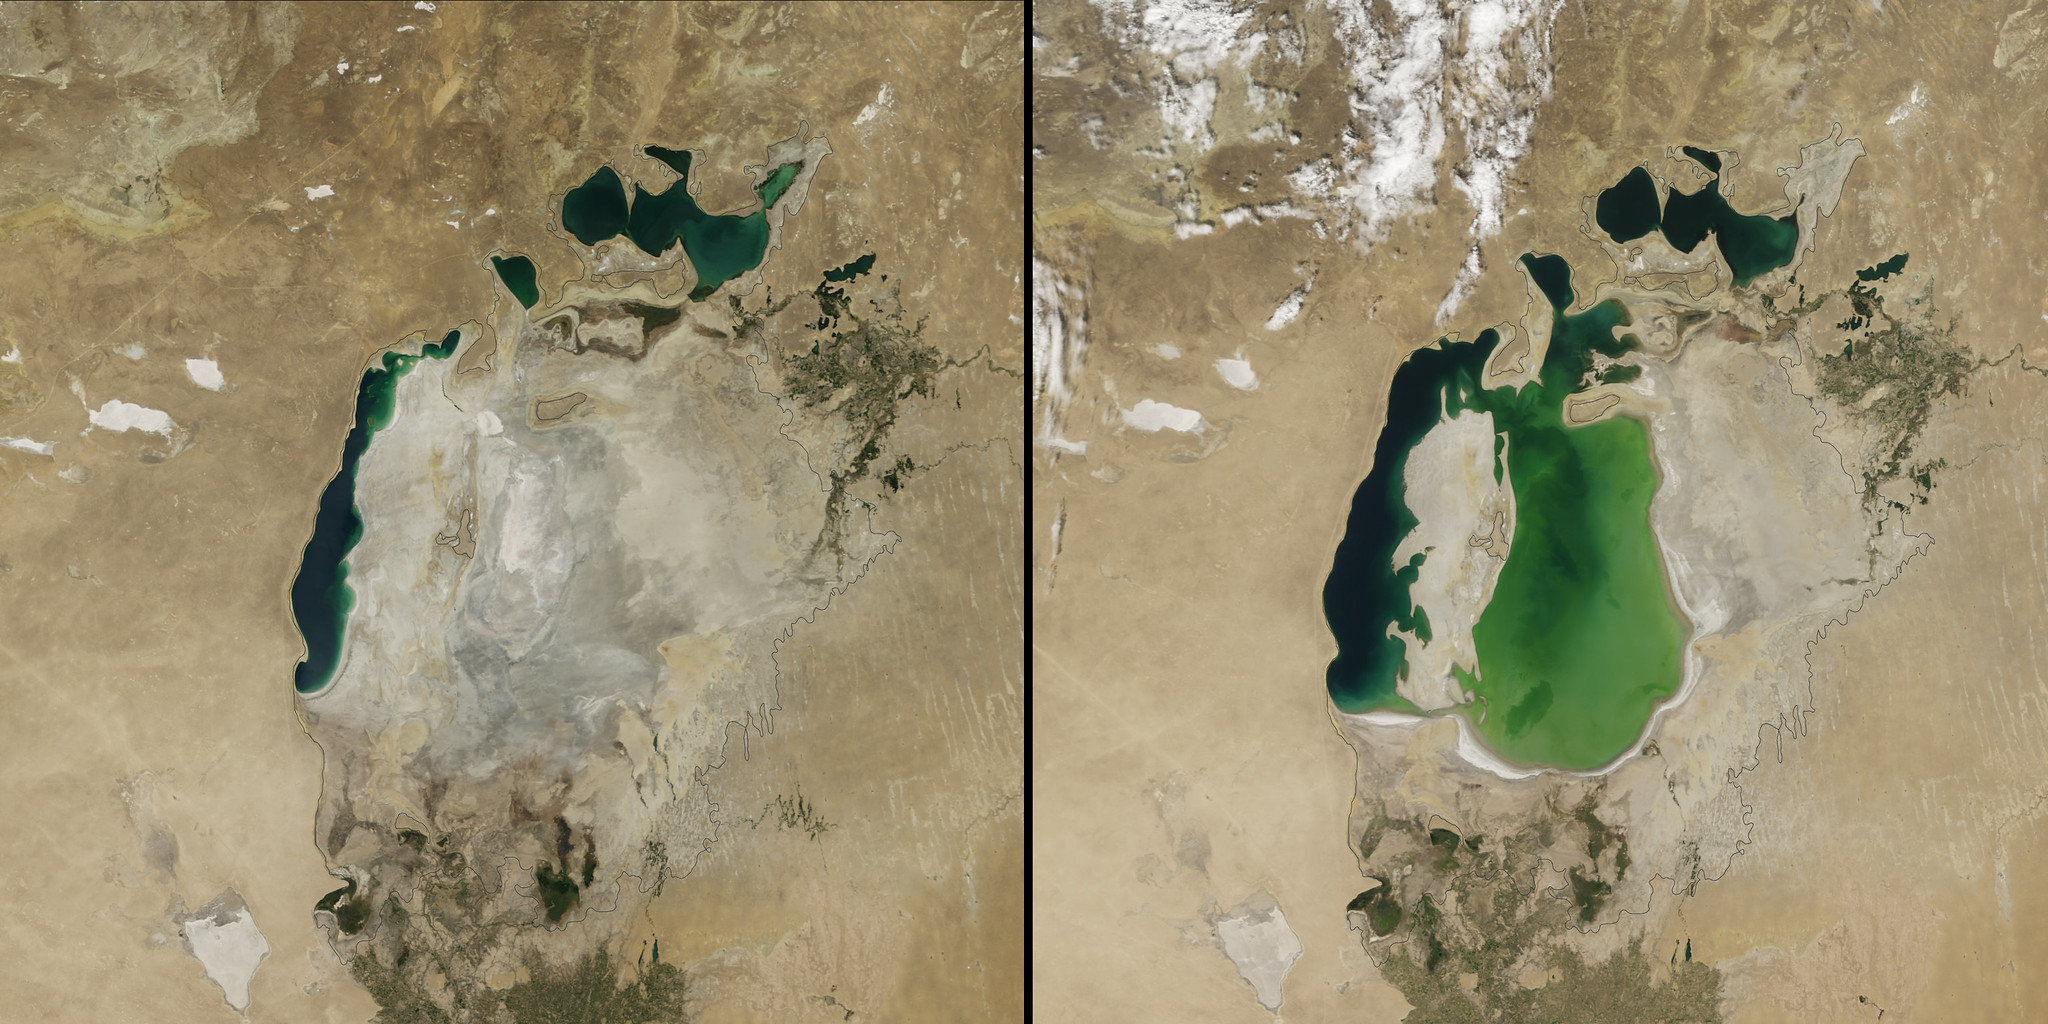 Shrinking Aral Sea